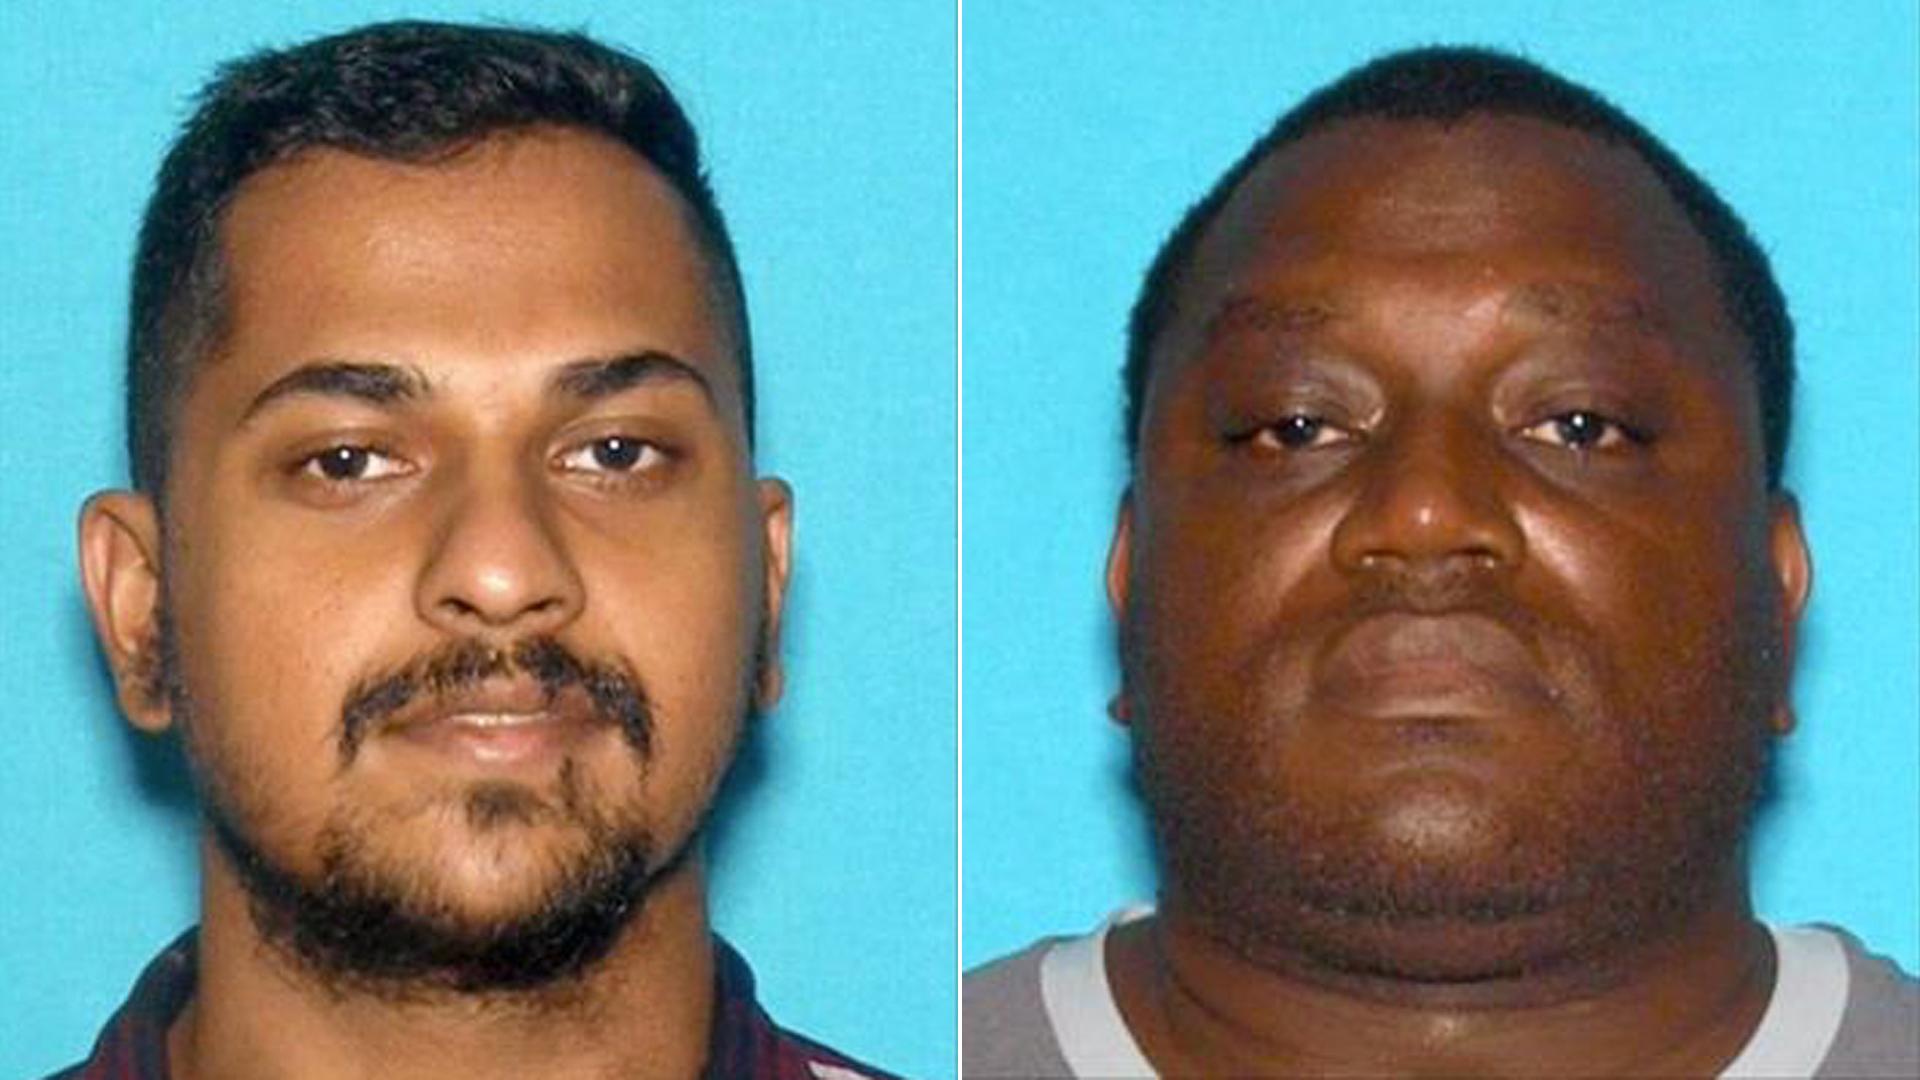 Homicide victim Abishek Sudhesh Bhat, 25, of San Bernardino, at left, and suspect Eric Devon Turner, 42, of San Bernardino, at right, pictured in photos released by the San Bernardino Police Department on Nov. 30, 2019.